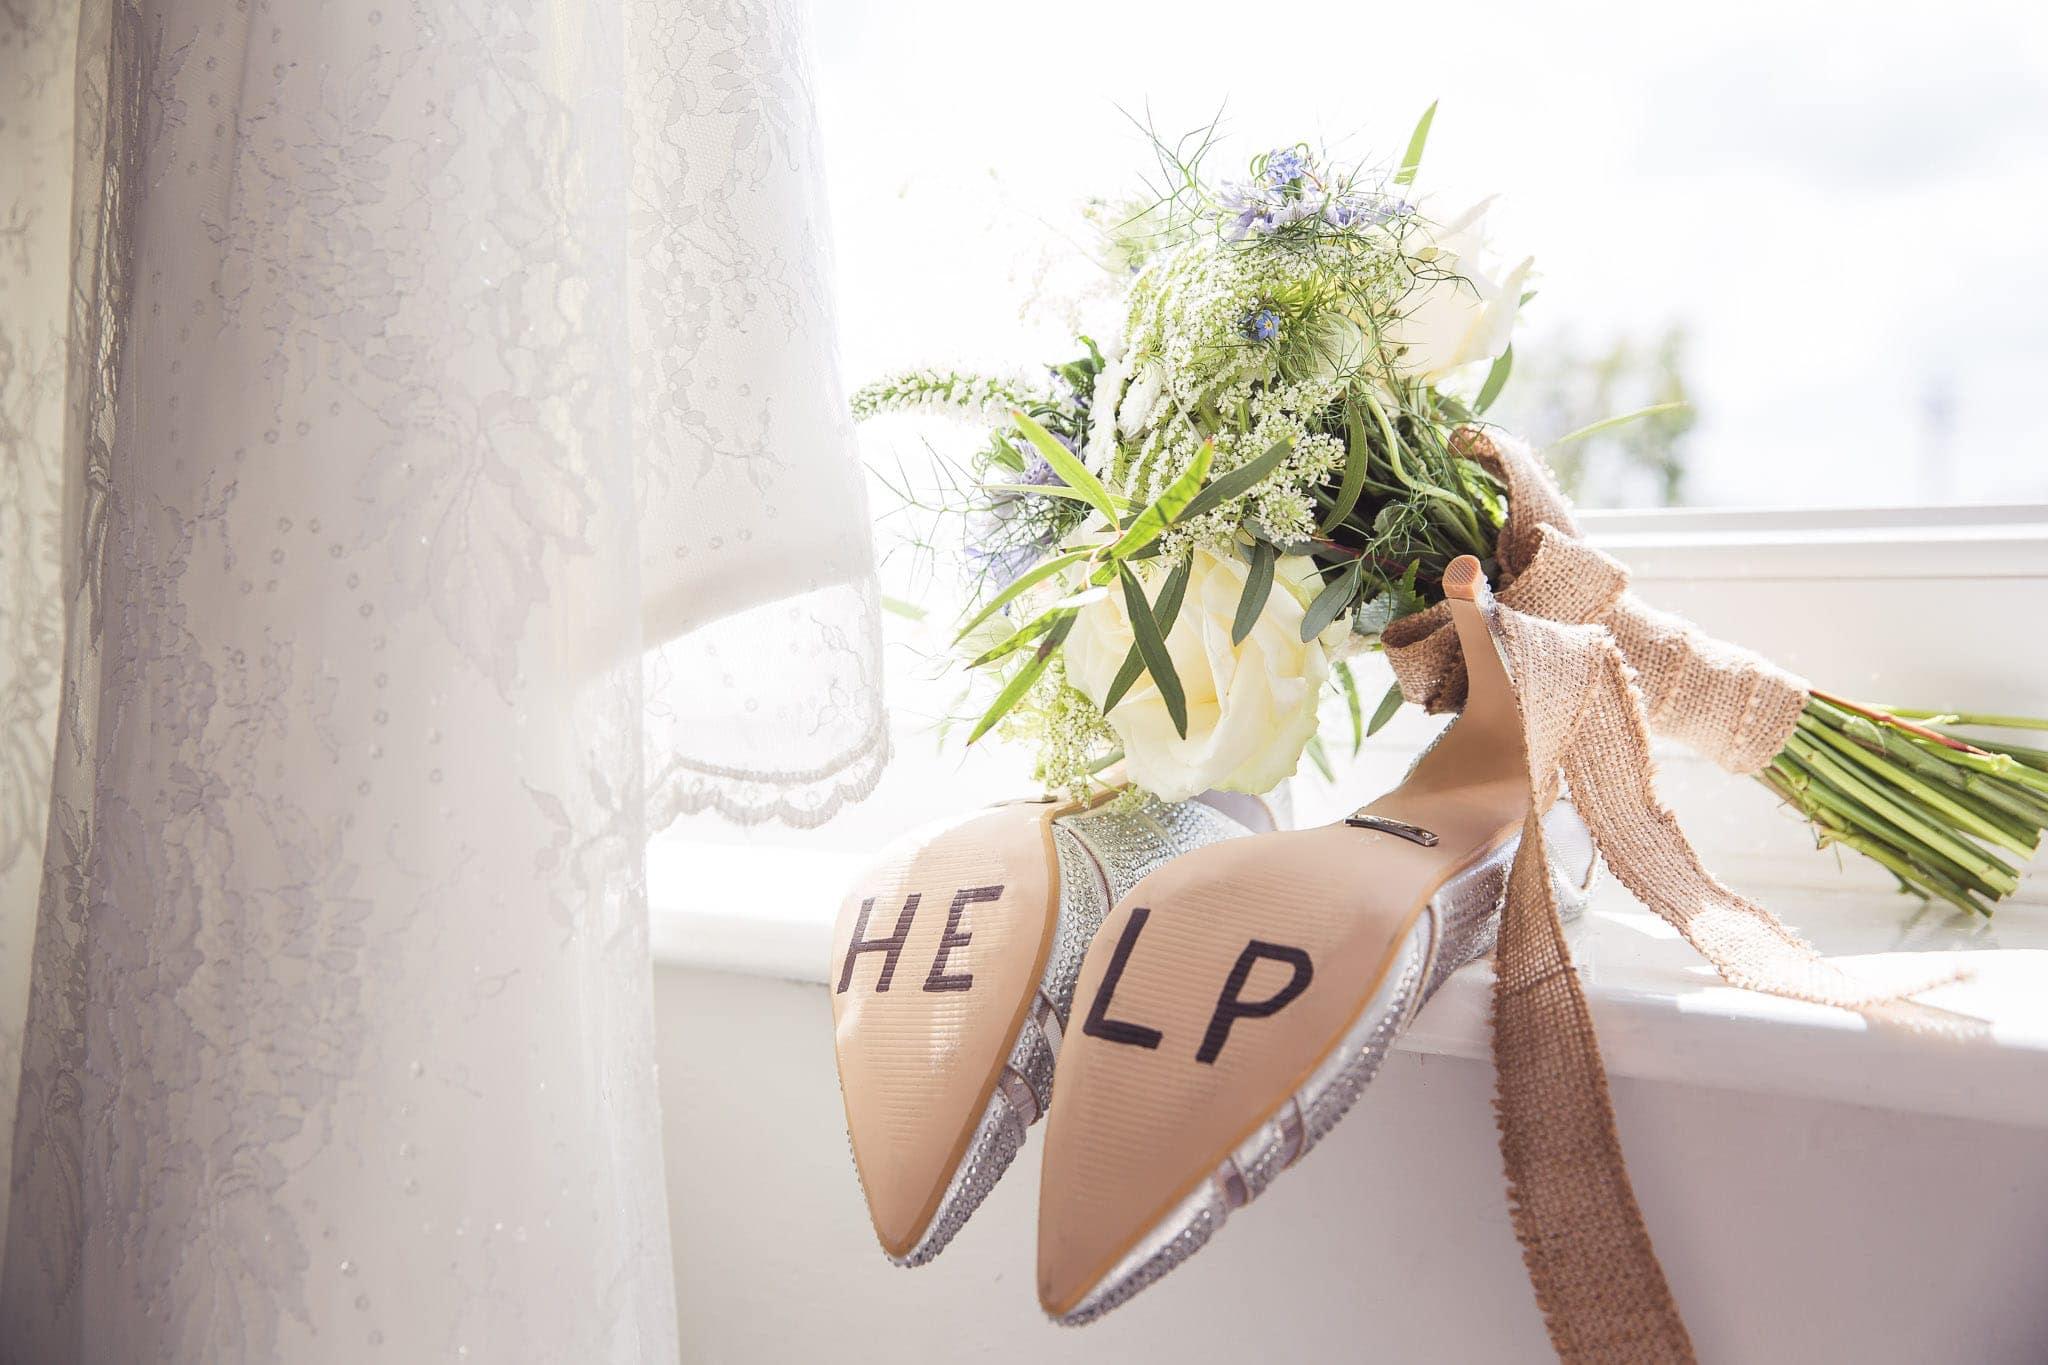 Catherine-George-Wedding-Cannington-Bridgwater-Somerset-Katie-Mortimore-Photography-small-22